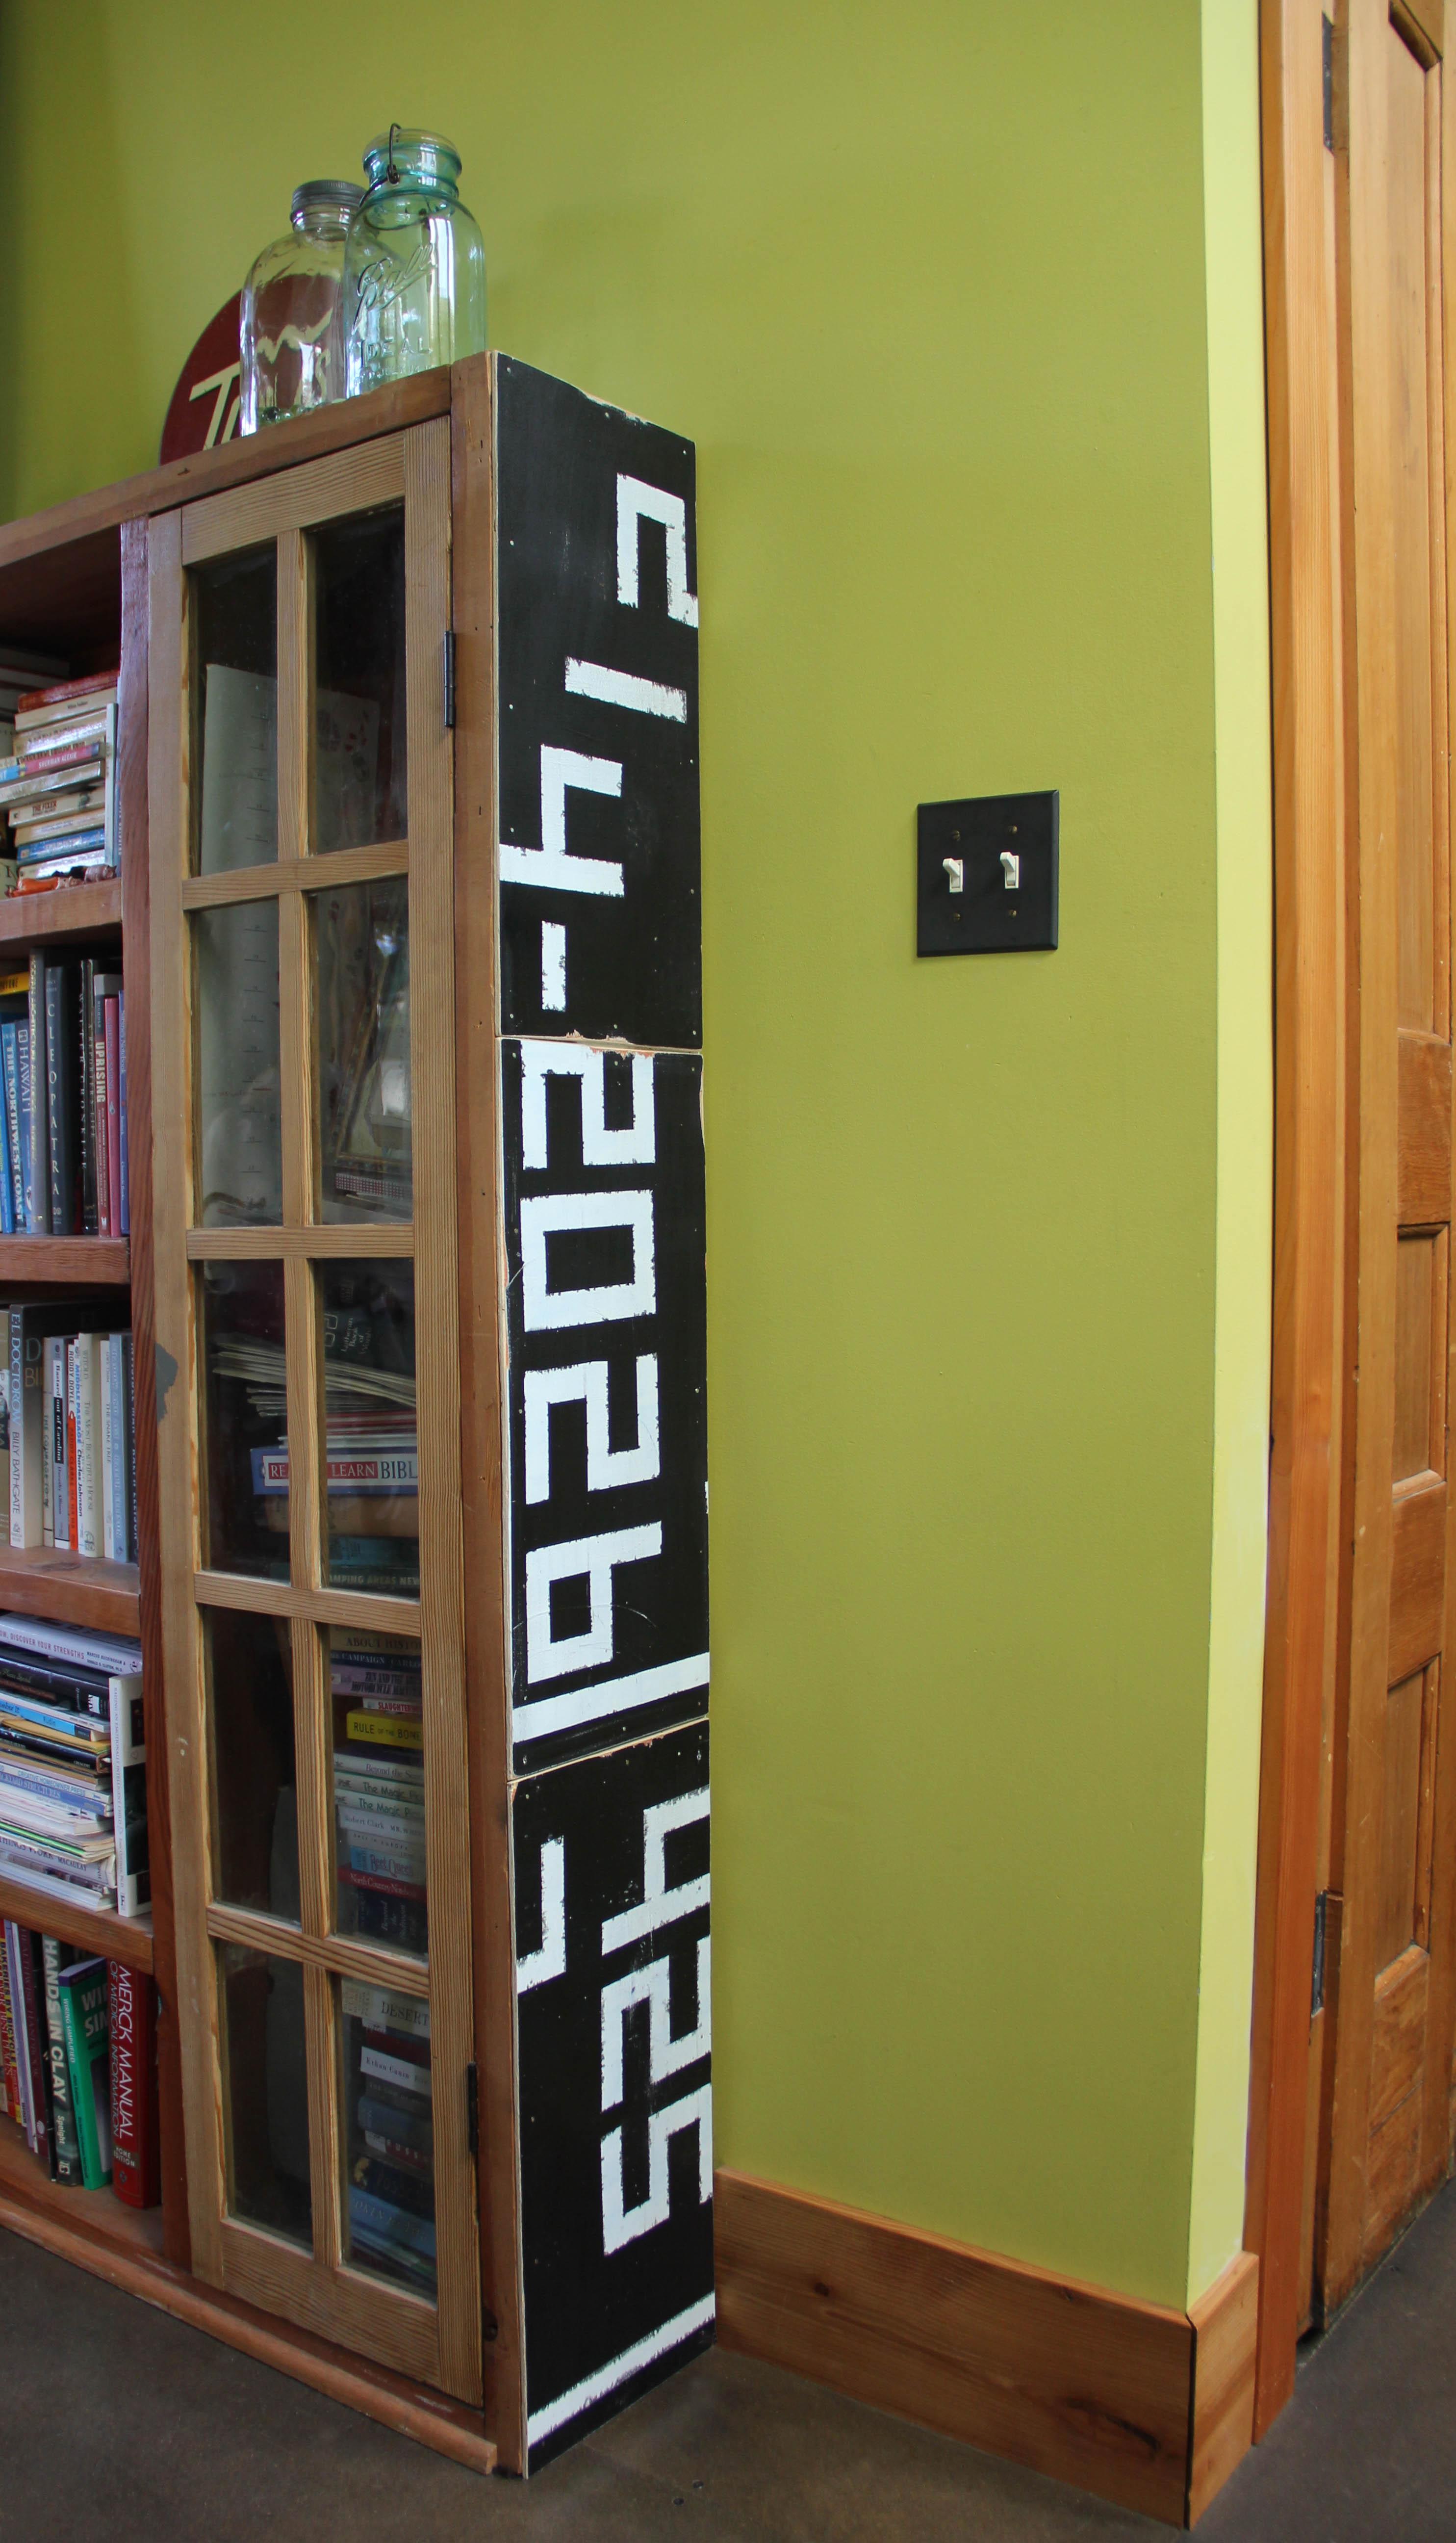 bookshelf building materials